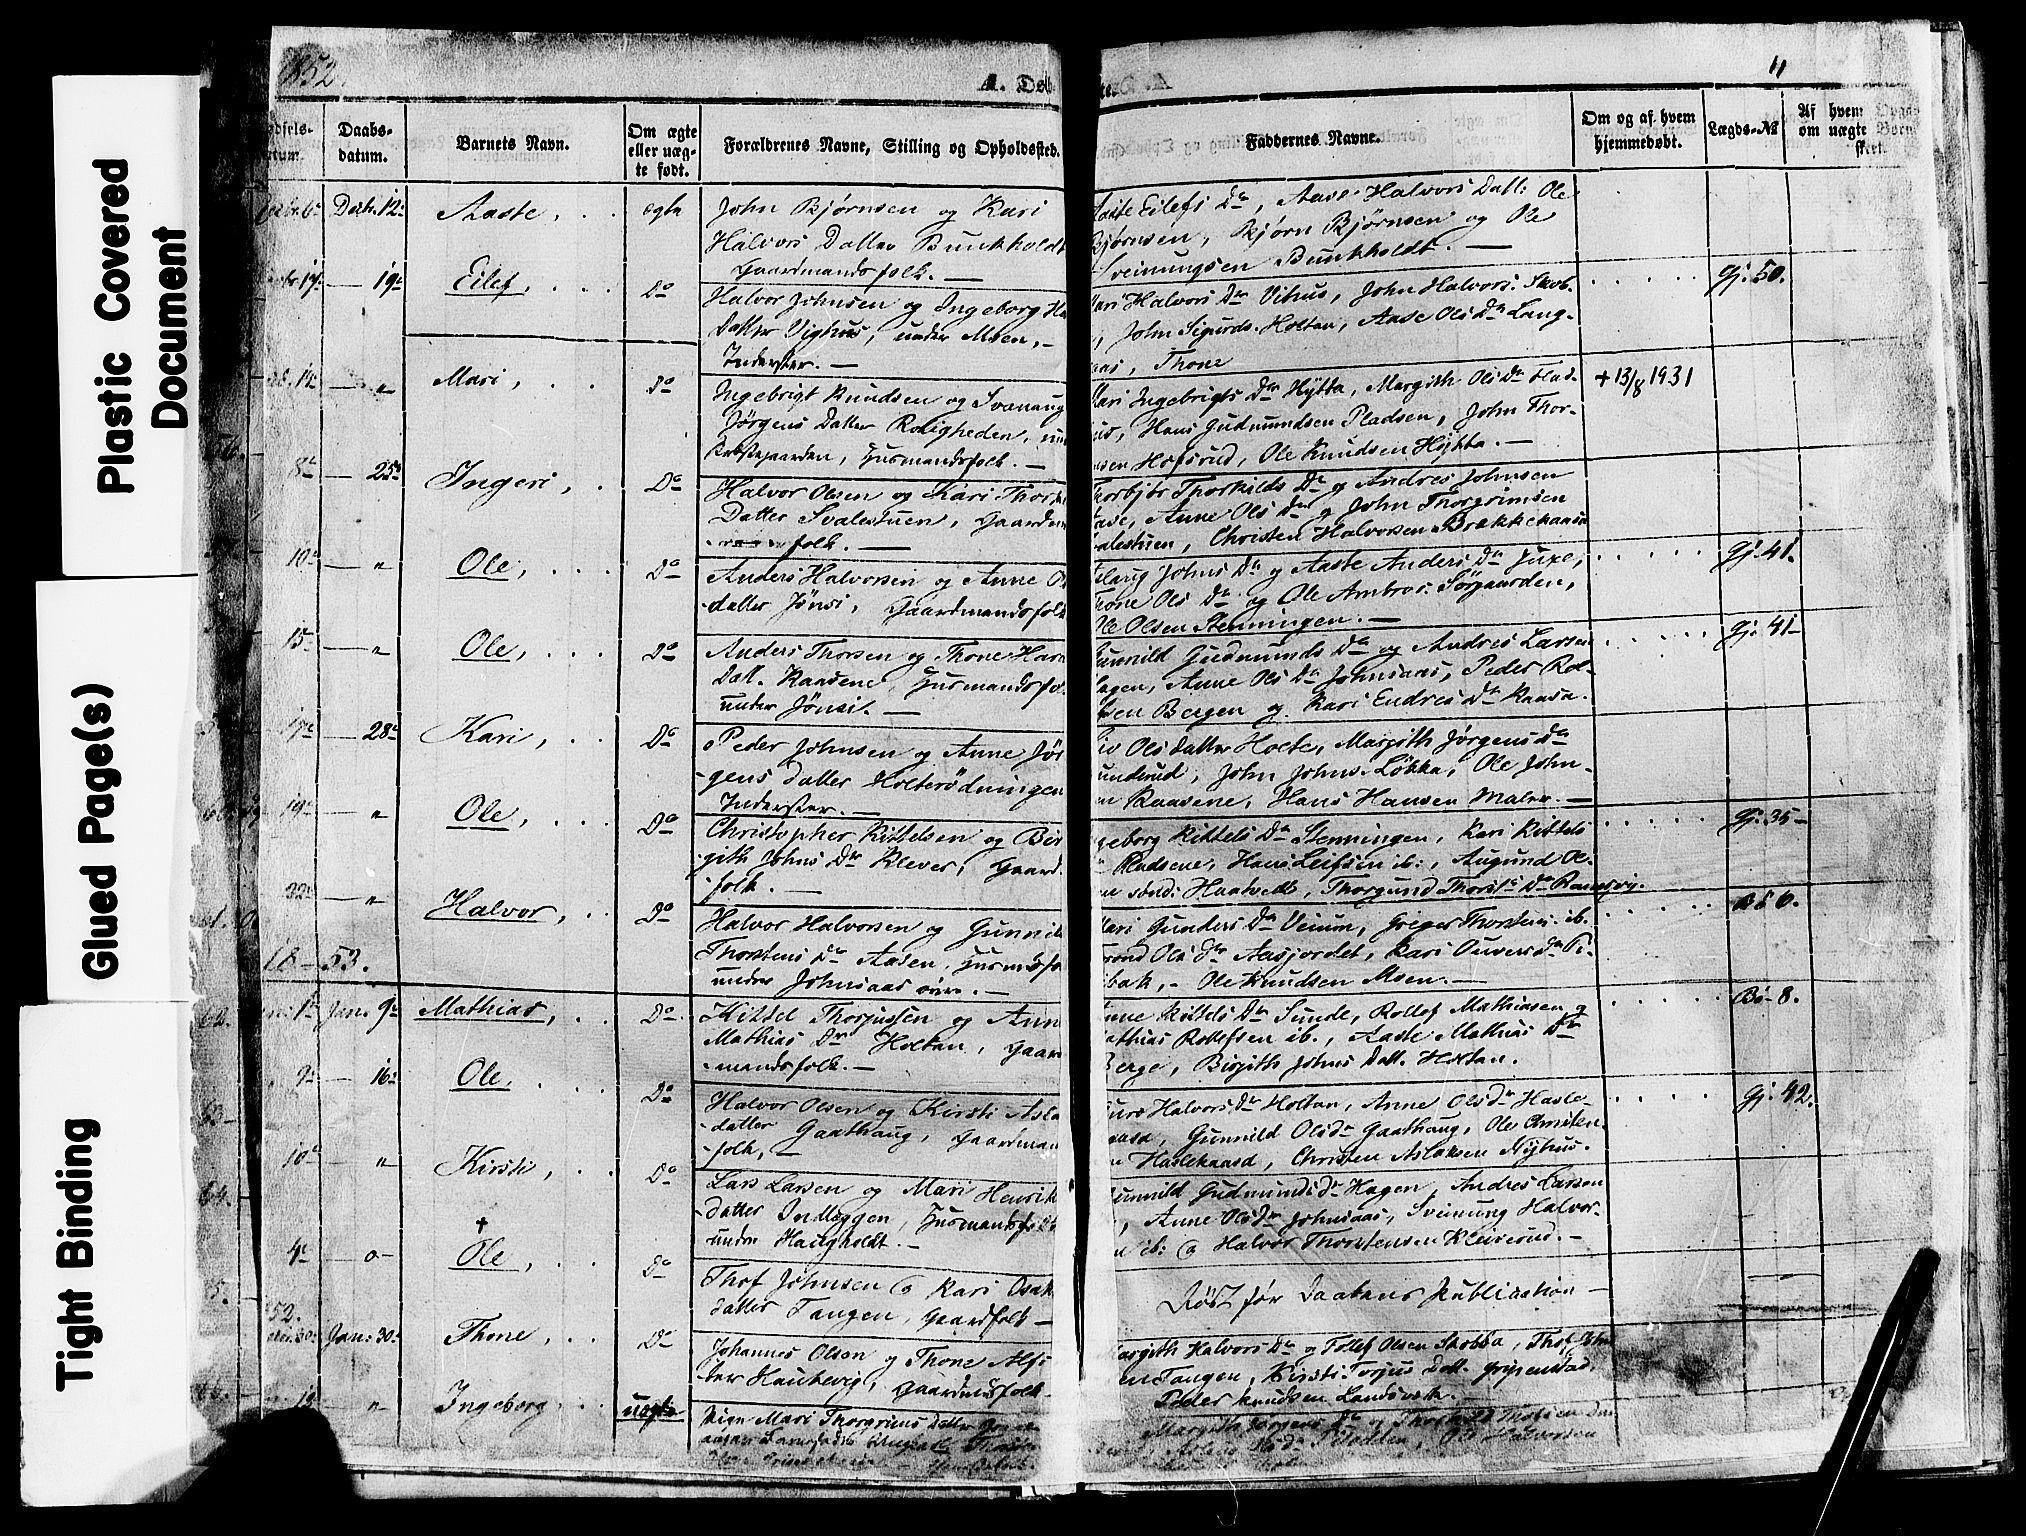 SAKO, Sauherad kirkebøker, F/Fa/L0007: Ministerialbok nr. I 7, 1851-1873, s. 11